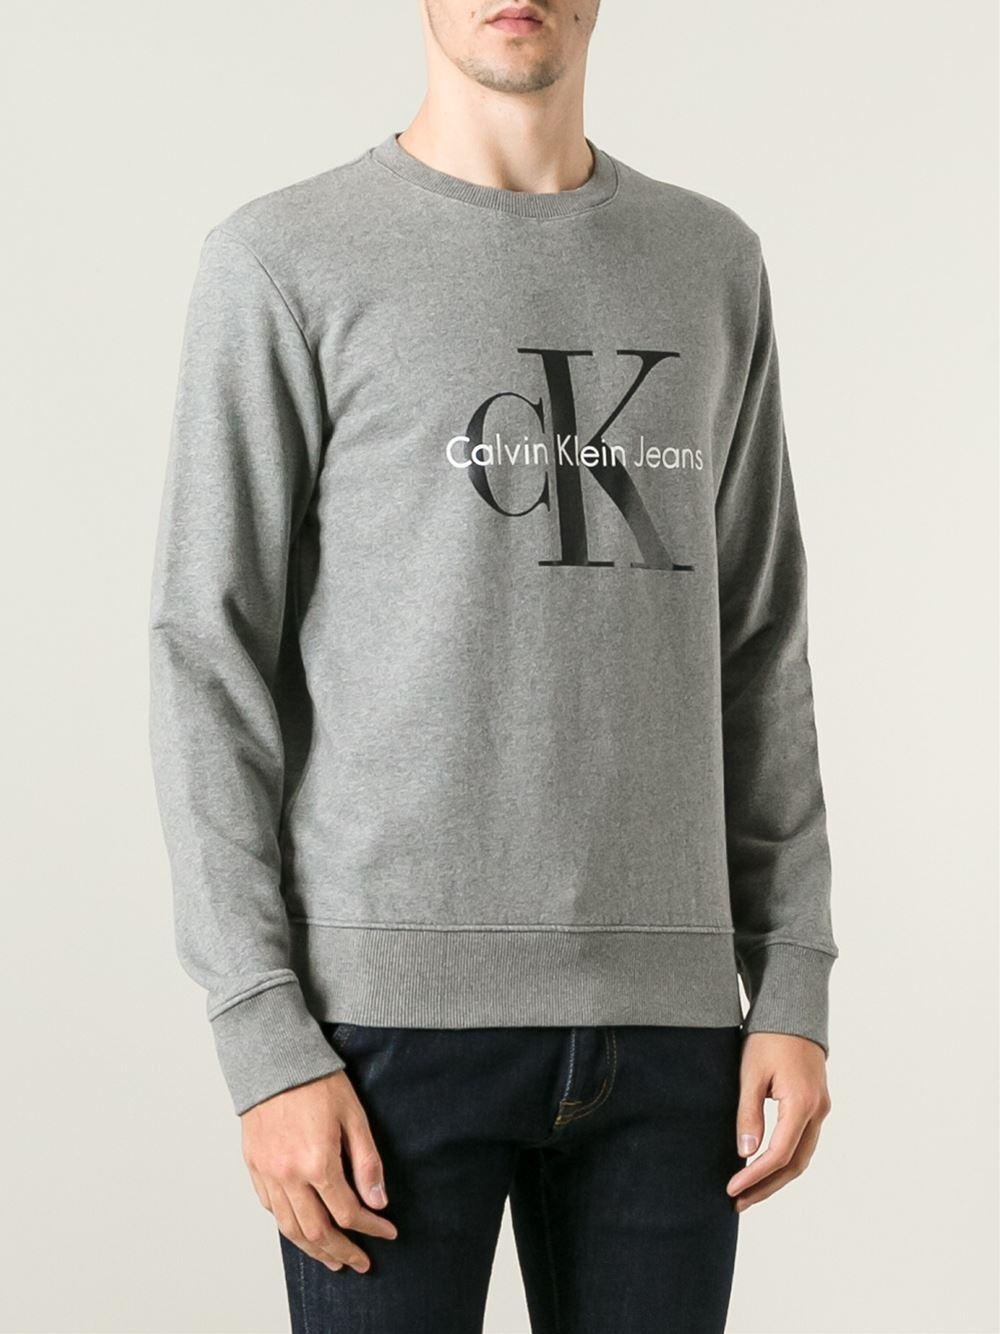 calvin klein jeans crew neck sweatshirt in gray for men. Black Bedroom Furniture Sets. Home Design Ideas